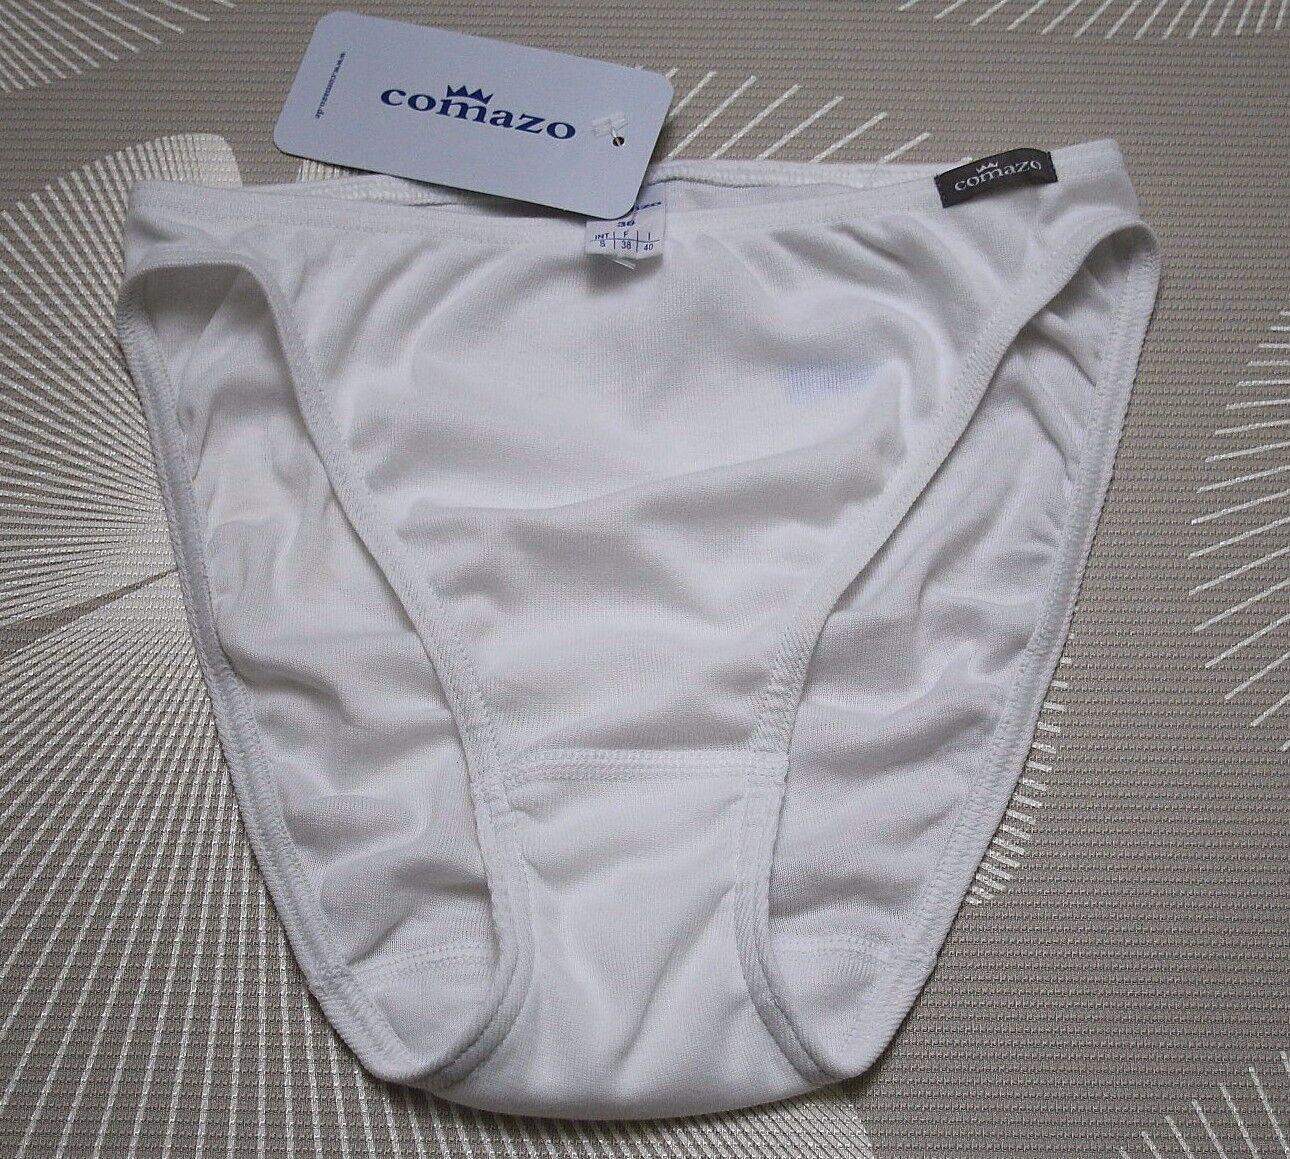 Comazo Damen Rio Slip Tai 100% Baumwolle weiß / earth NEU